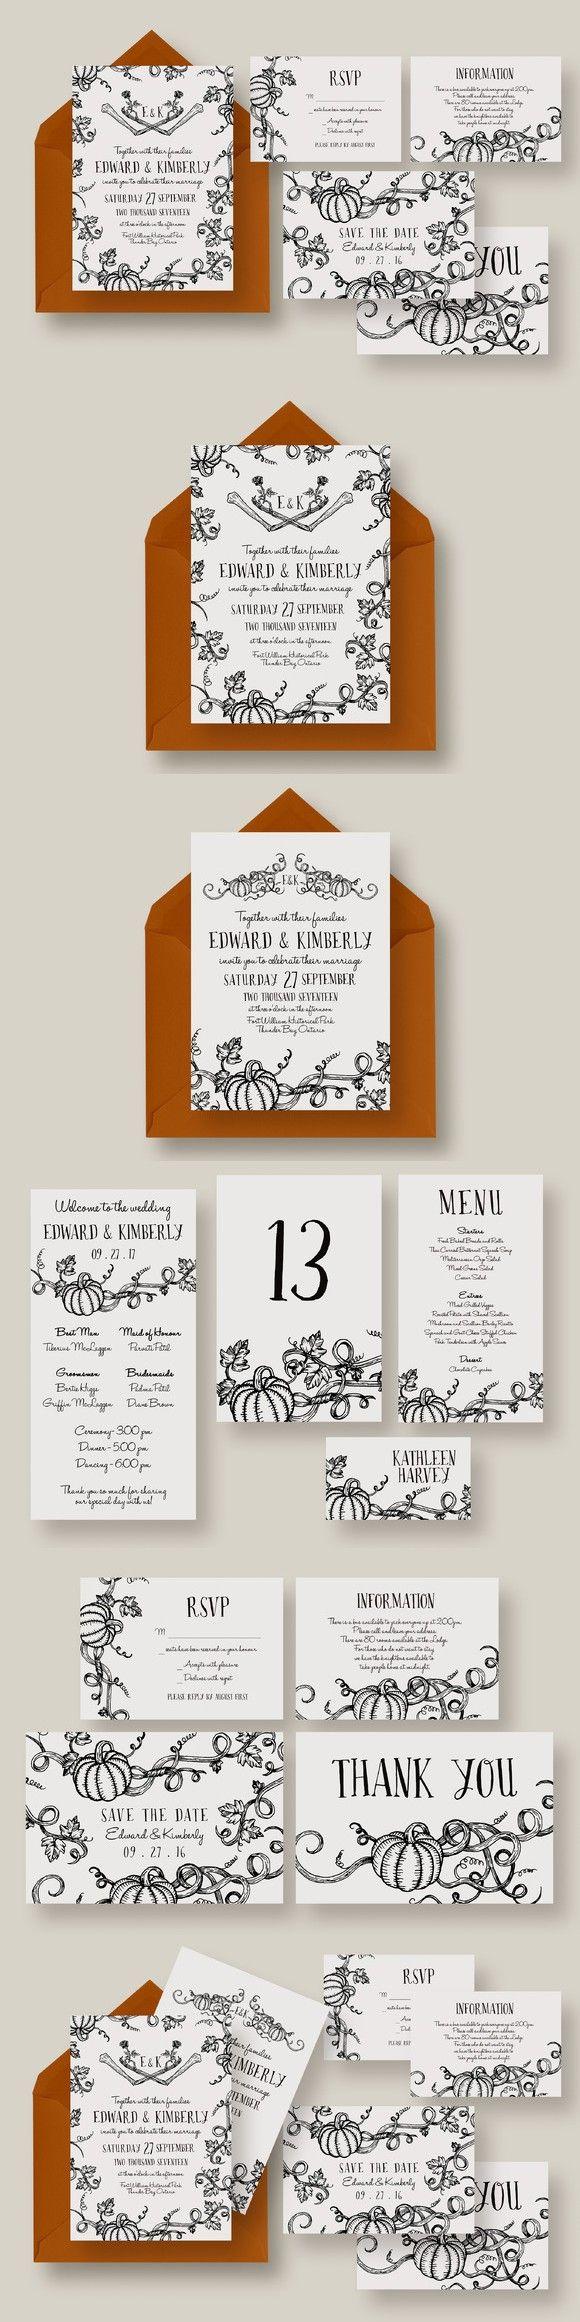 61 Best Halloween Wedding Ideas Images On Pinterest Dream Wedding